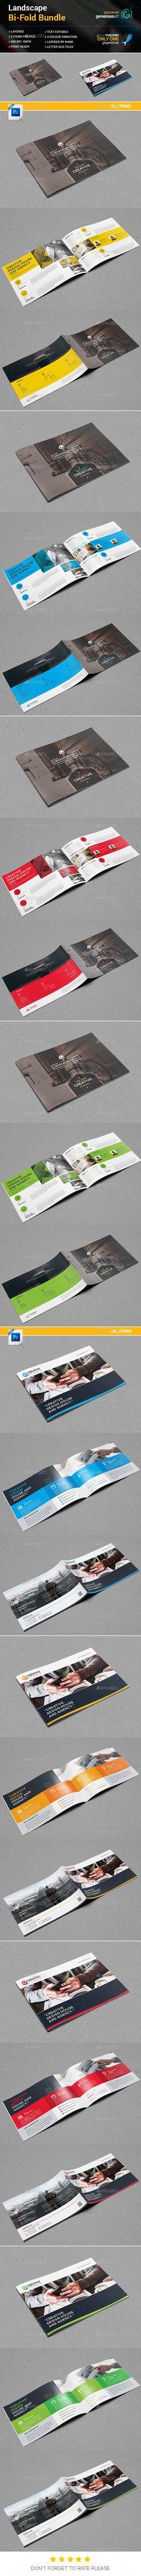 Landscape Bi-Fold Brochure 2 in 1 - Corporate Brochures Download here : https://graphicriver.net/item/landscape-bifold-brochure-2-in-1/19275686?s_rank=114&ref=Al-fatih